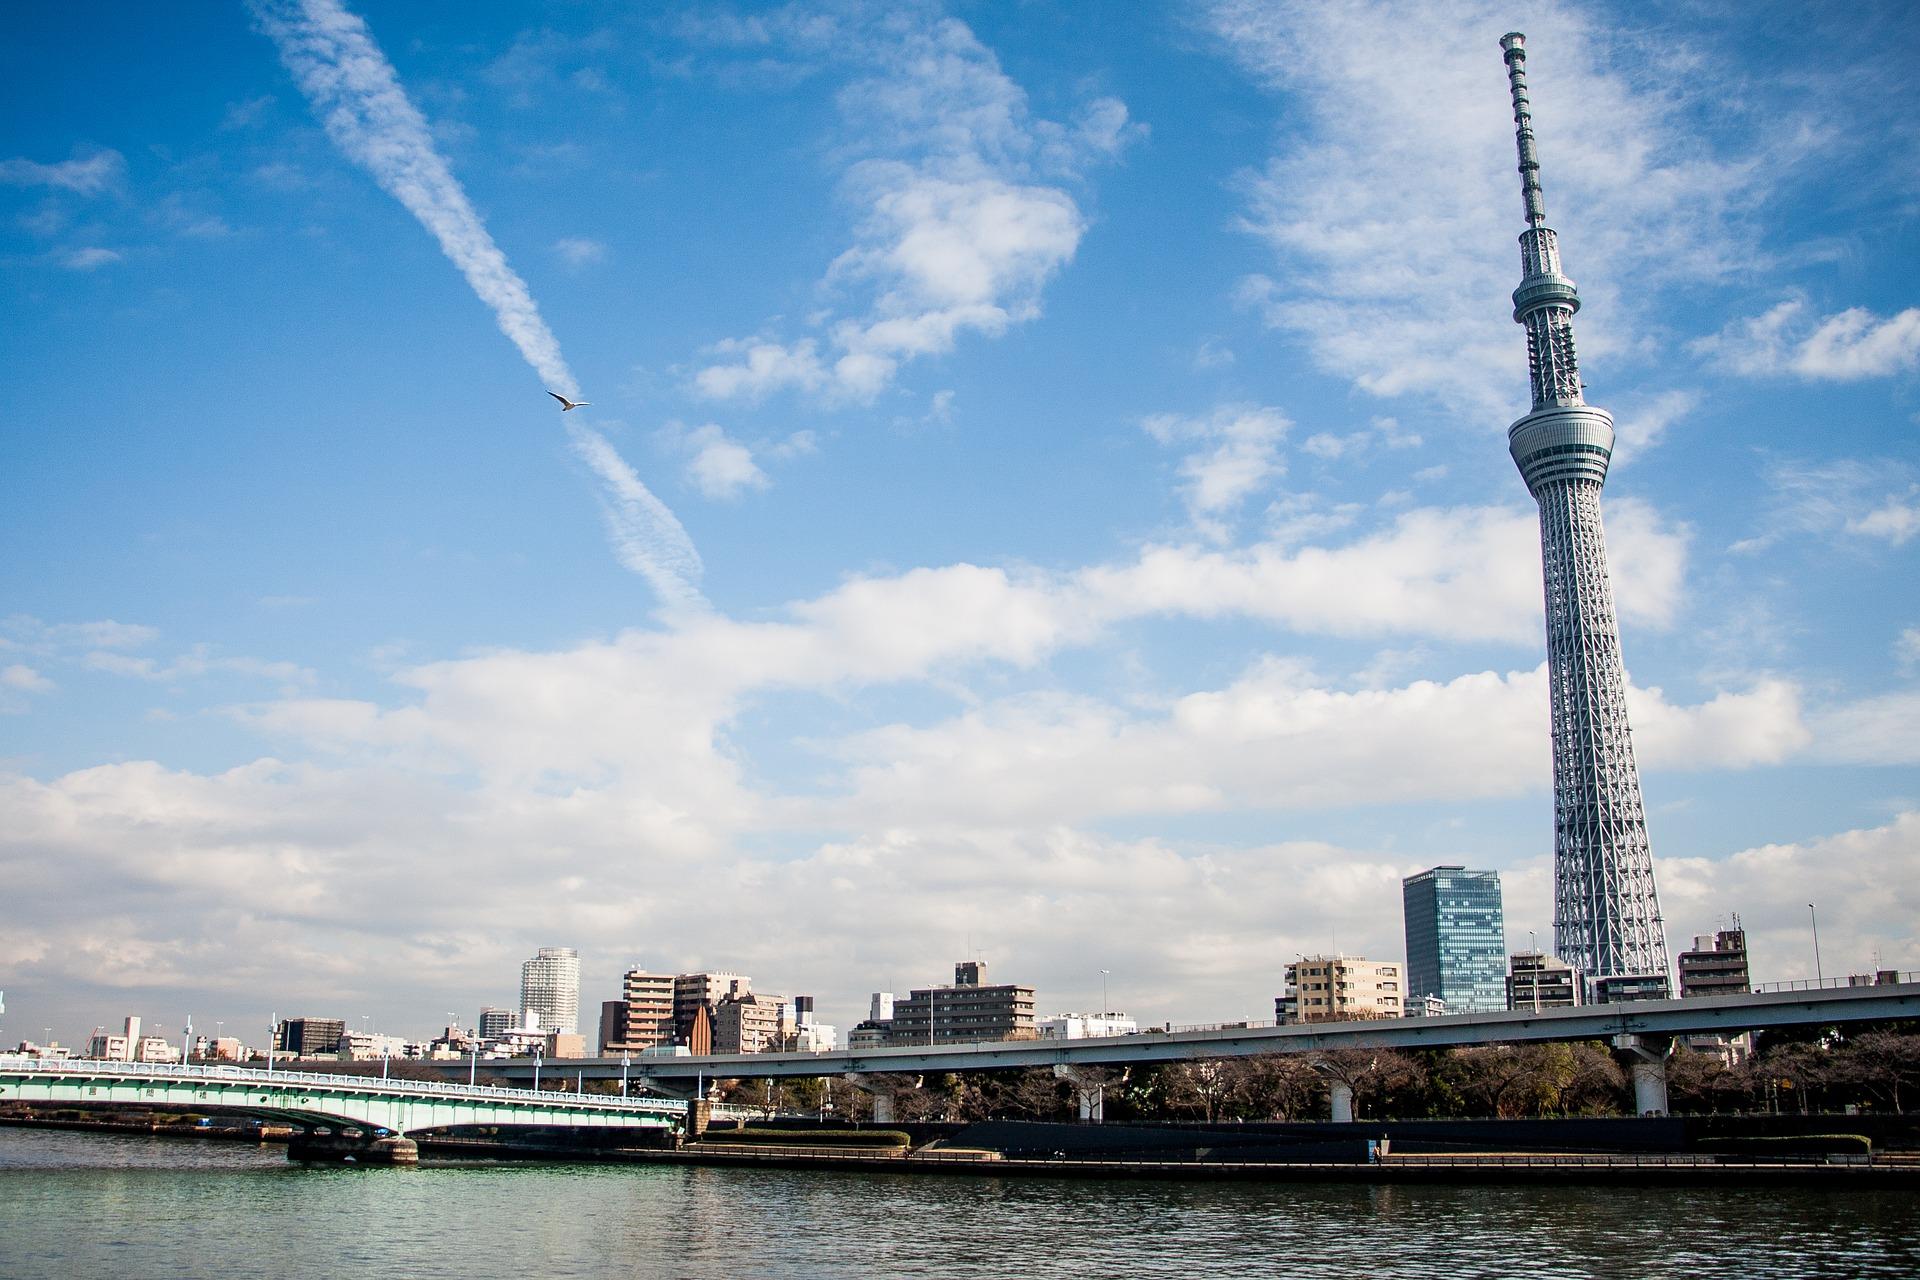 """Nature of Tokyo Skytree"" © Jirapon Prohsunthorn (Pixabay)"